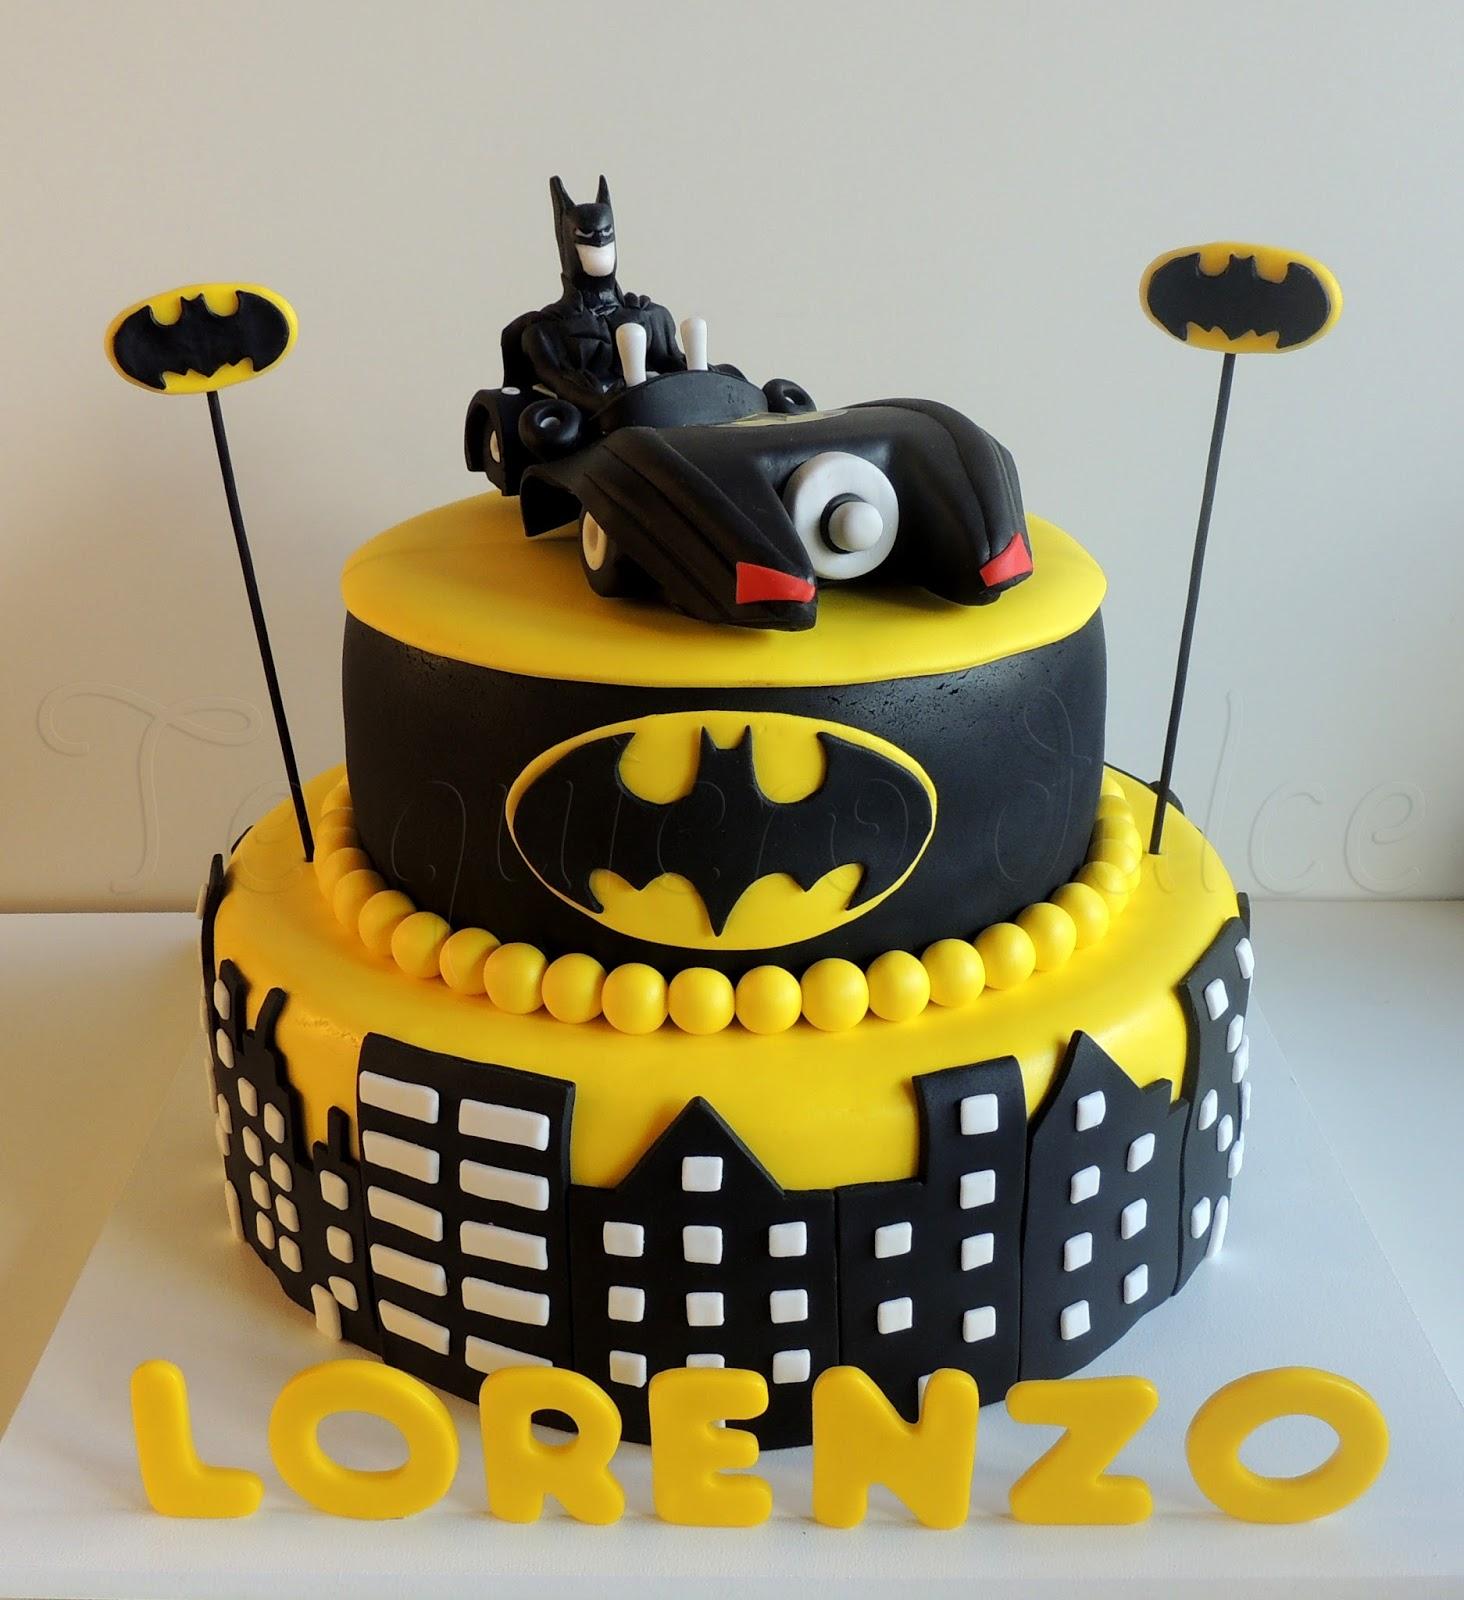 Batman Joker Cake Images